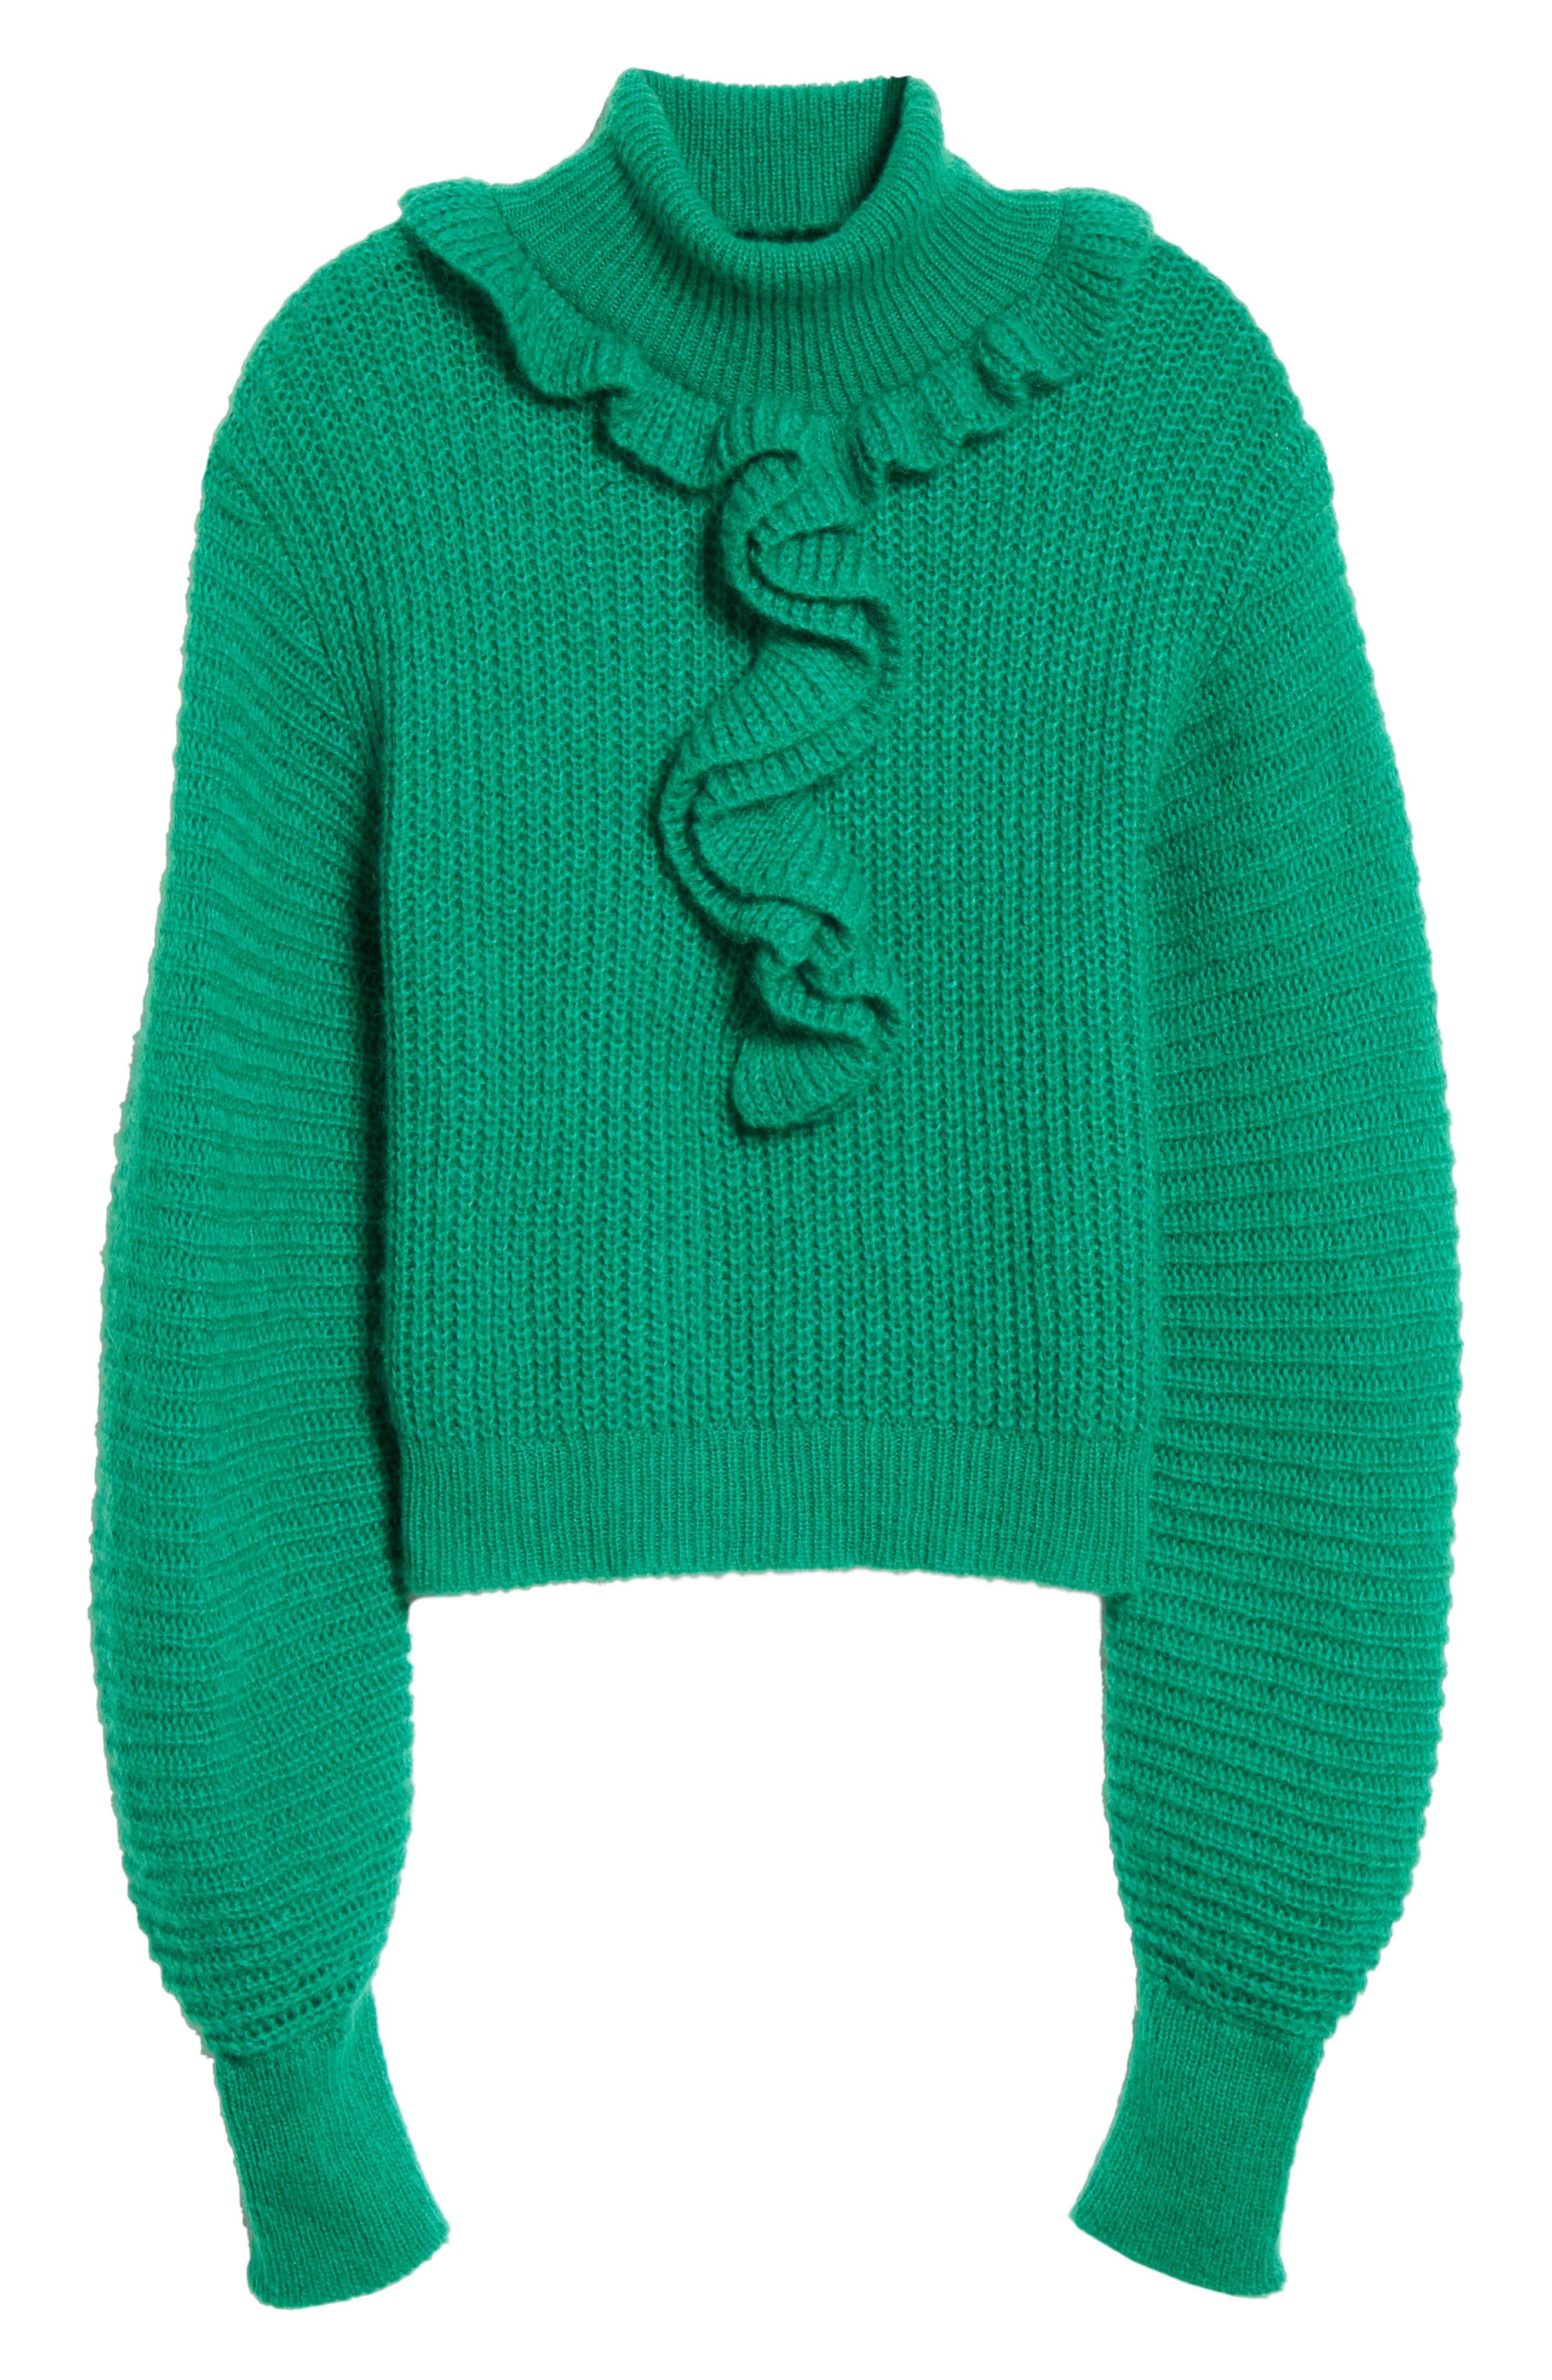 Ruffle Neck Sweater,                             Alternate thumbnail 6, color,                             GRASS GREEN